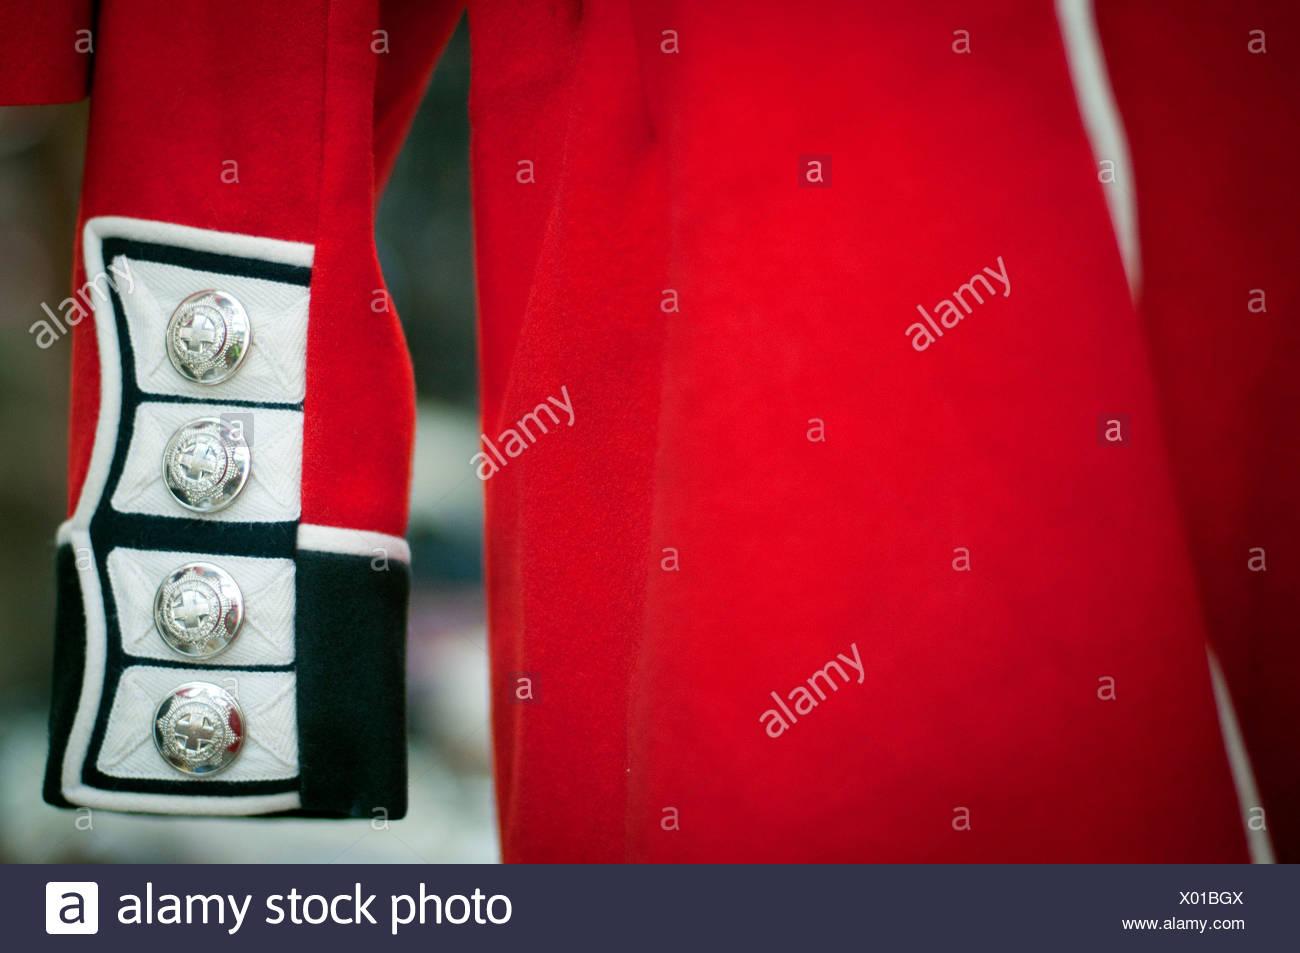 Detail of a guardsman costume, British Army, London, England, UK - Stock Image